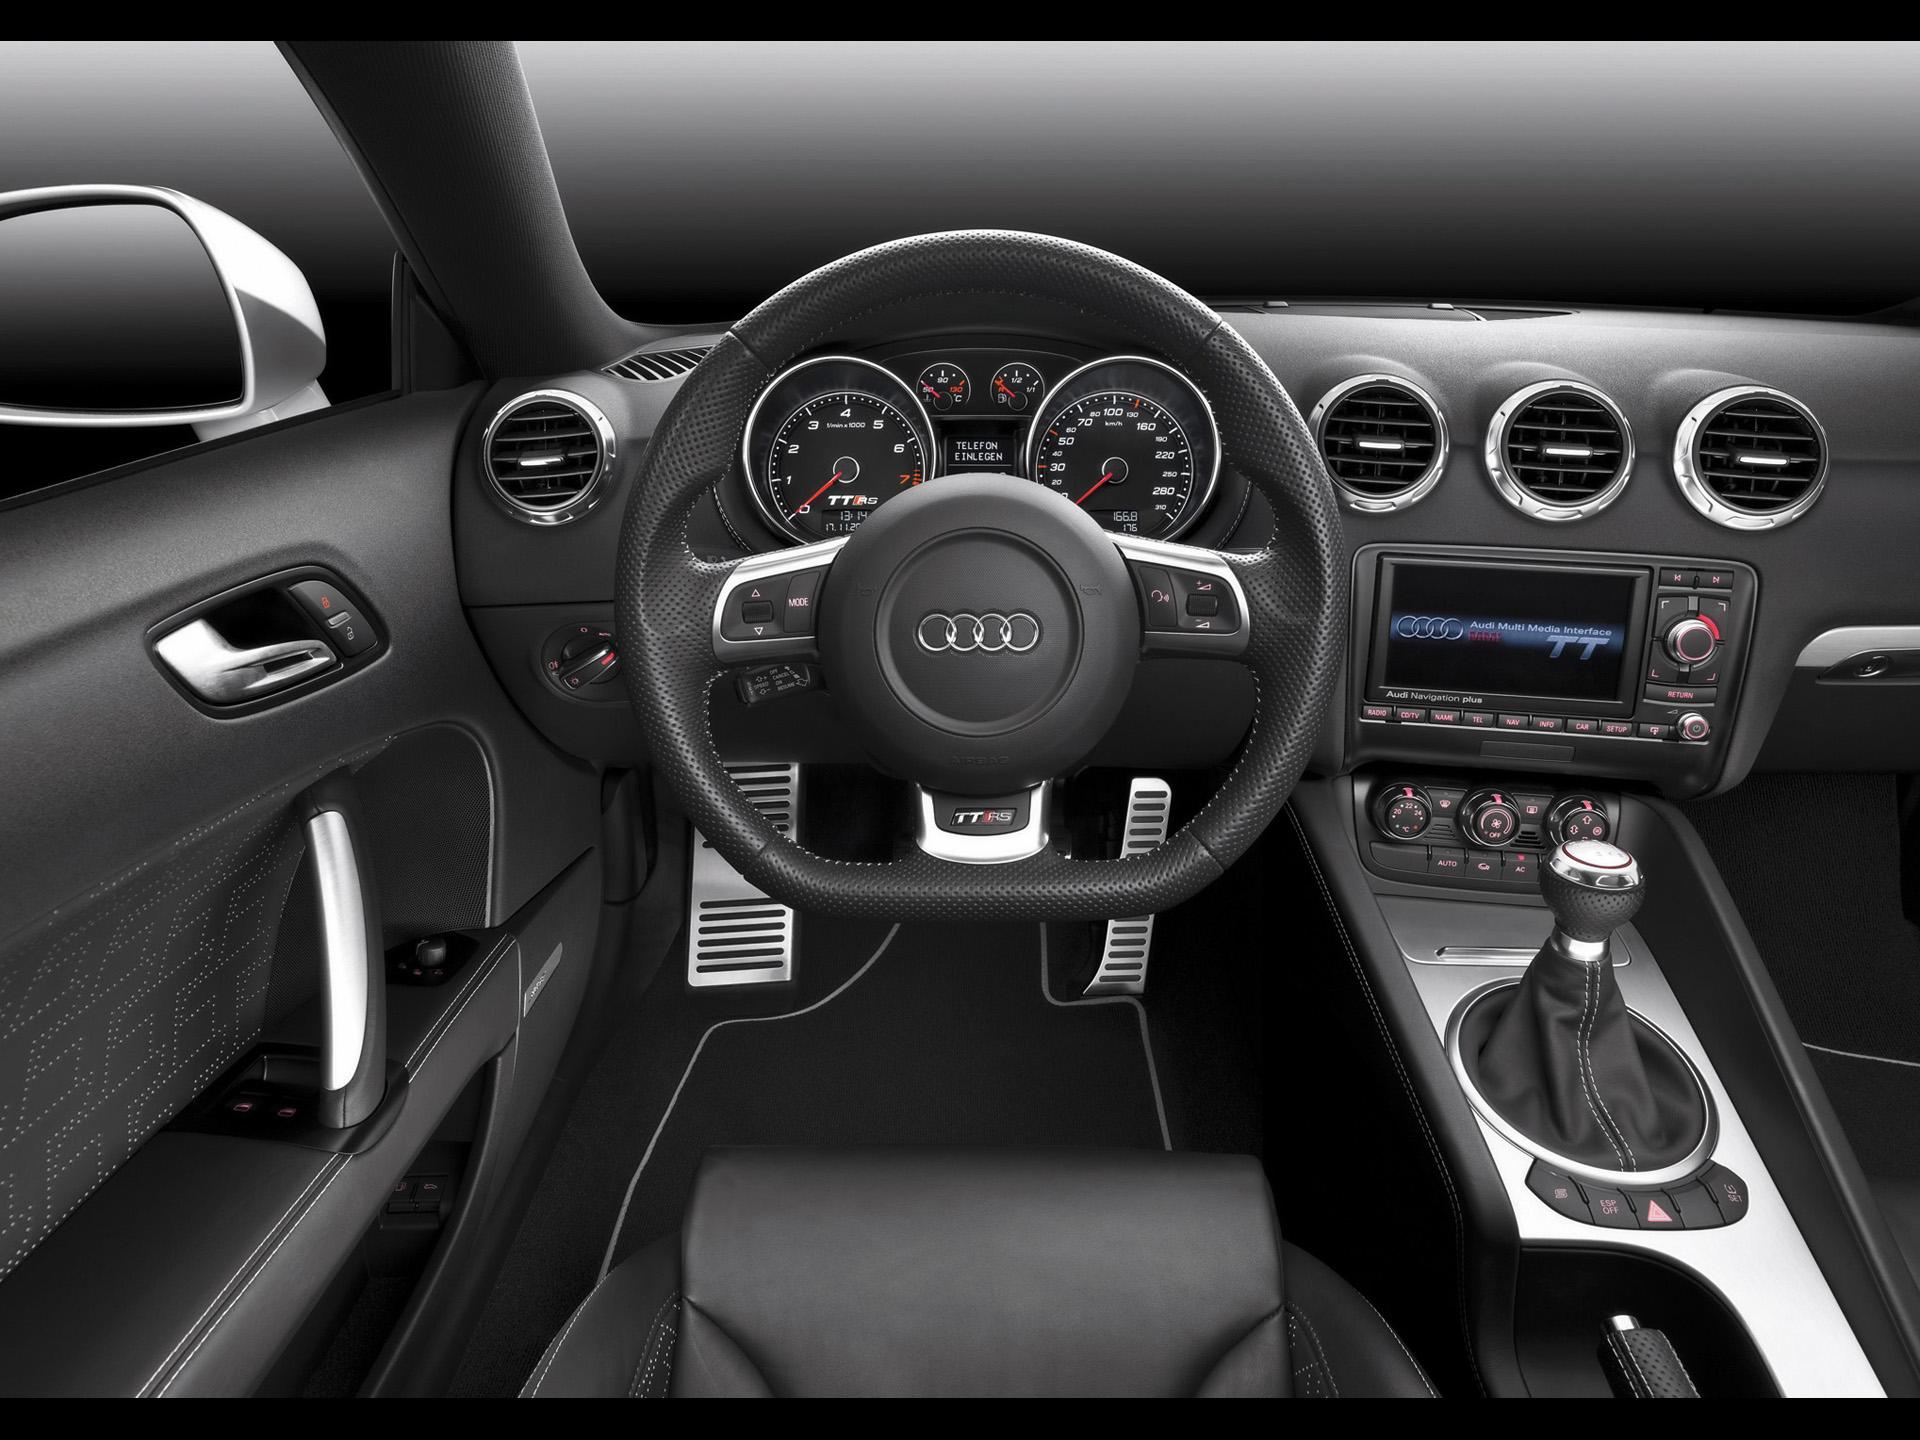 2009 audi tt rs coupe dashboard 1920x1440 jpg